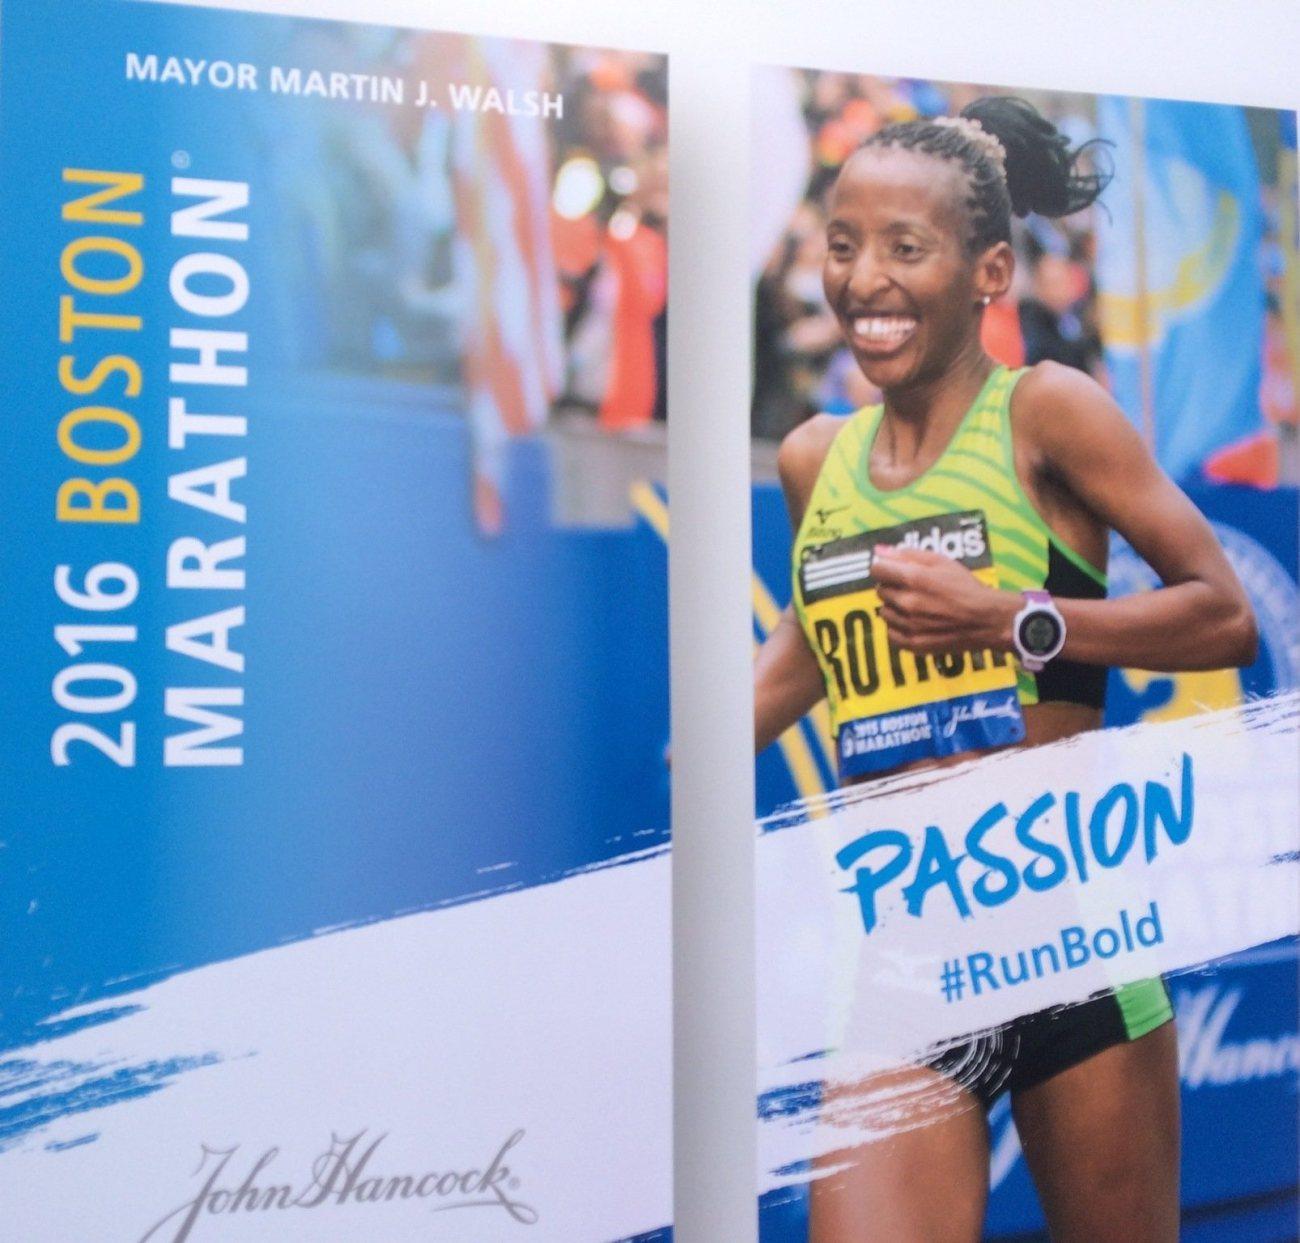 boston-marathon-banners-08jpg-141850c2cf7dbd8c